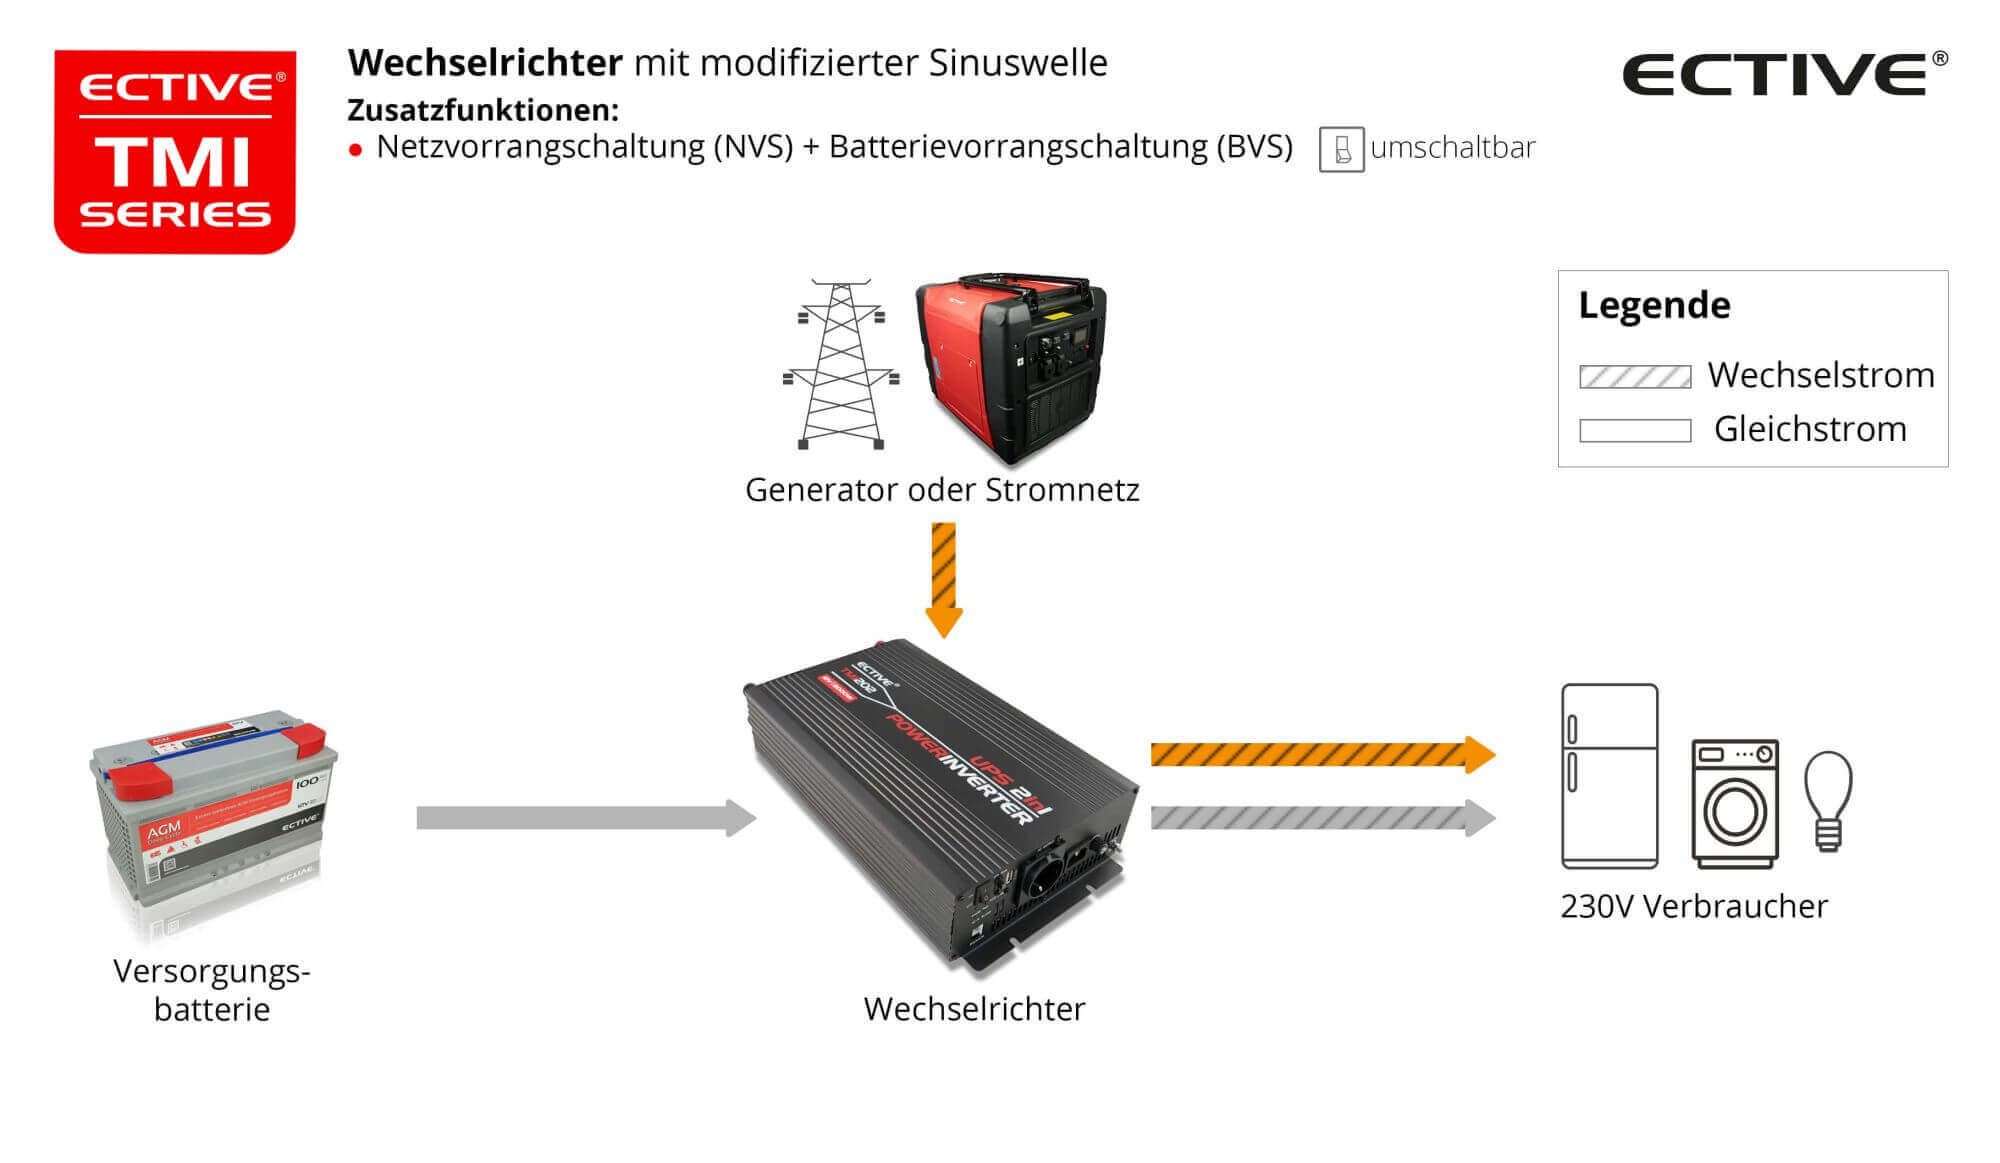 ECTIVE TMI152 Power-Inverter 1500W/12V Wechselrichter mit NVS